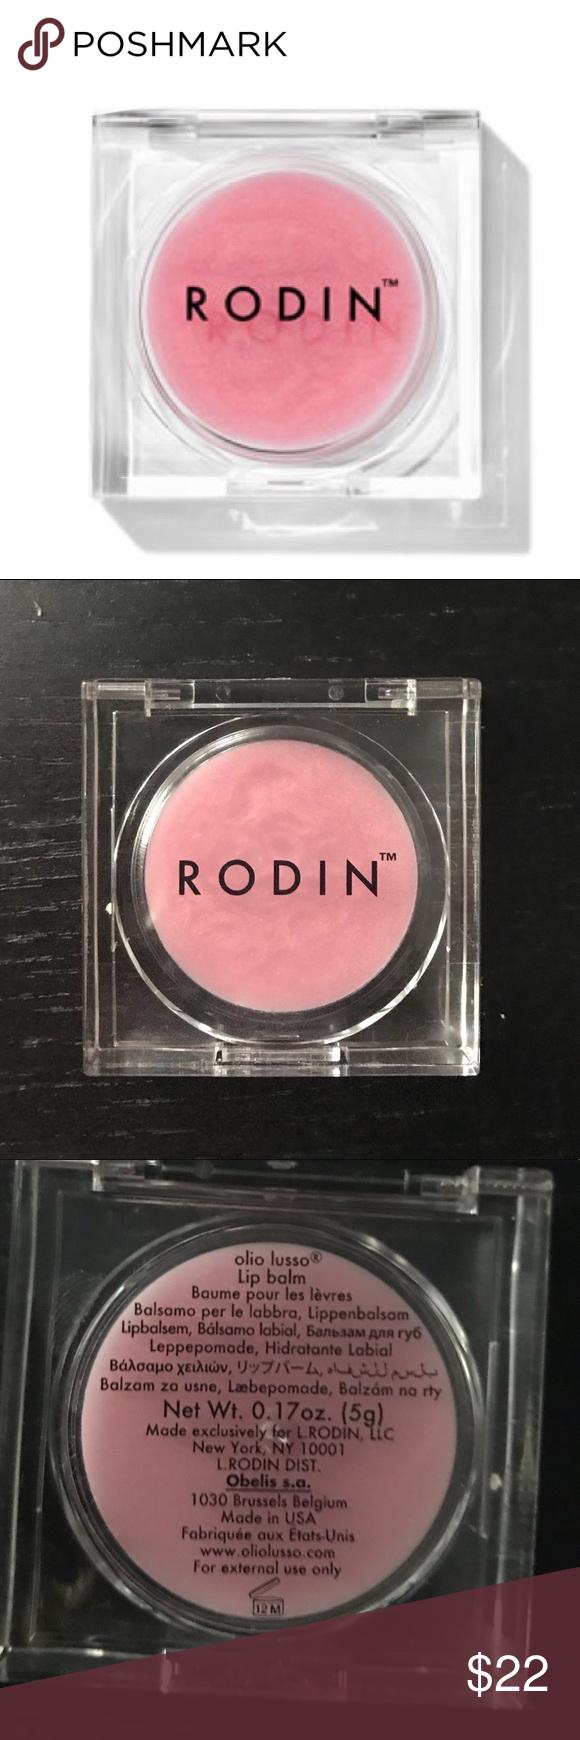 Rodin Lip Balm 0.17 oz. 5 In 1 Derma Roller Dermaroller Micro Needle Body Facial Skin Rejuvenation Health Care Kit Anti-Aging Tool, White